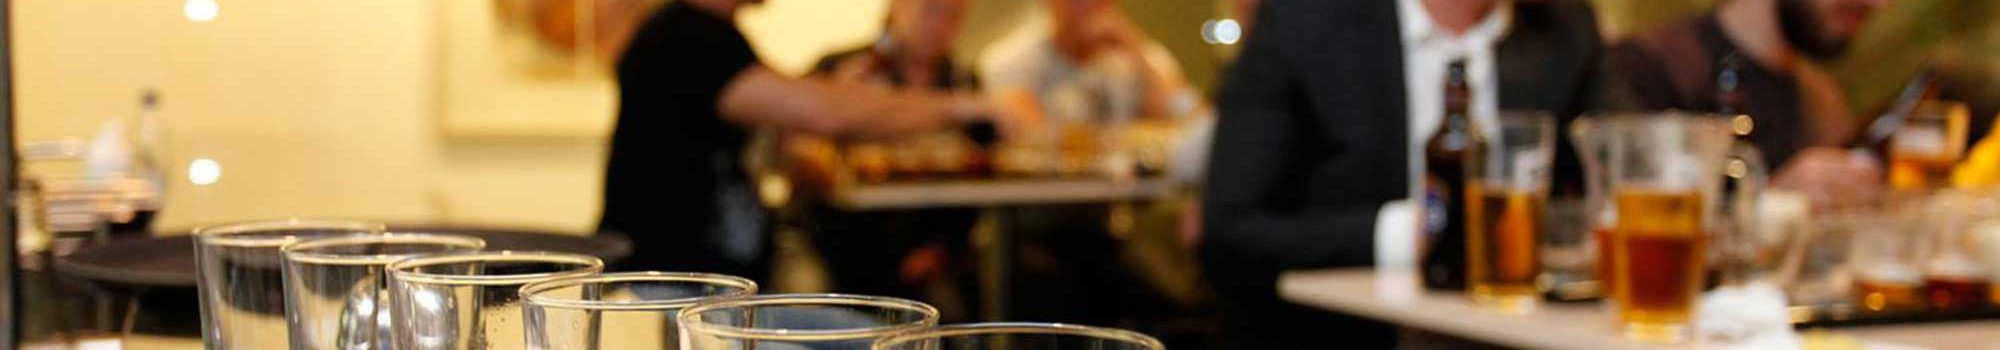 Beer Tasting Tour in Reykjavik Iceland